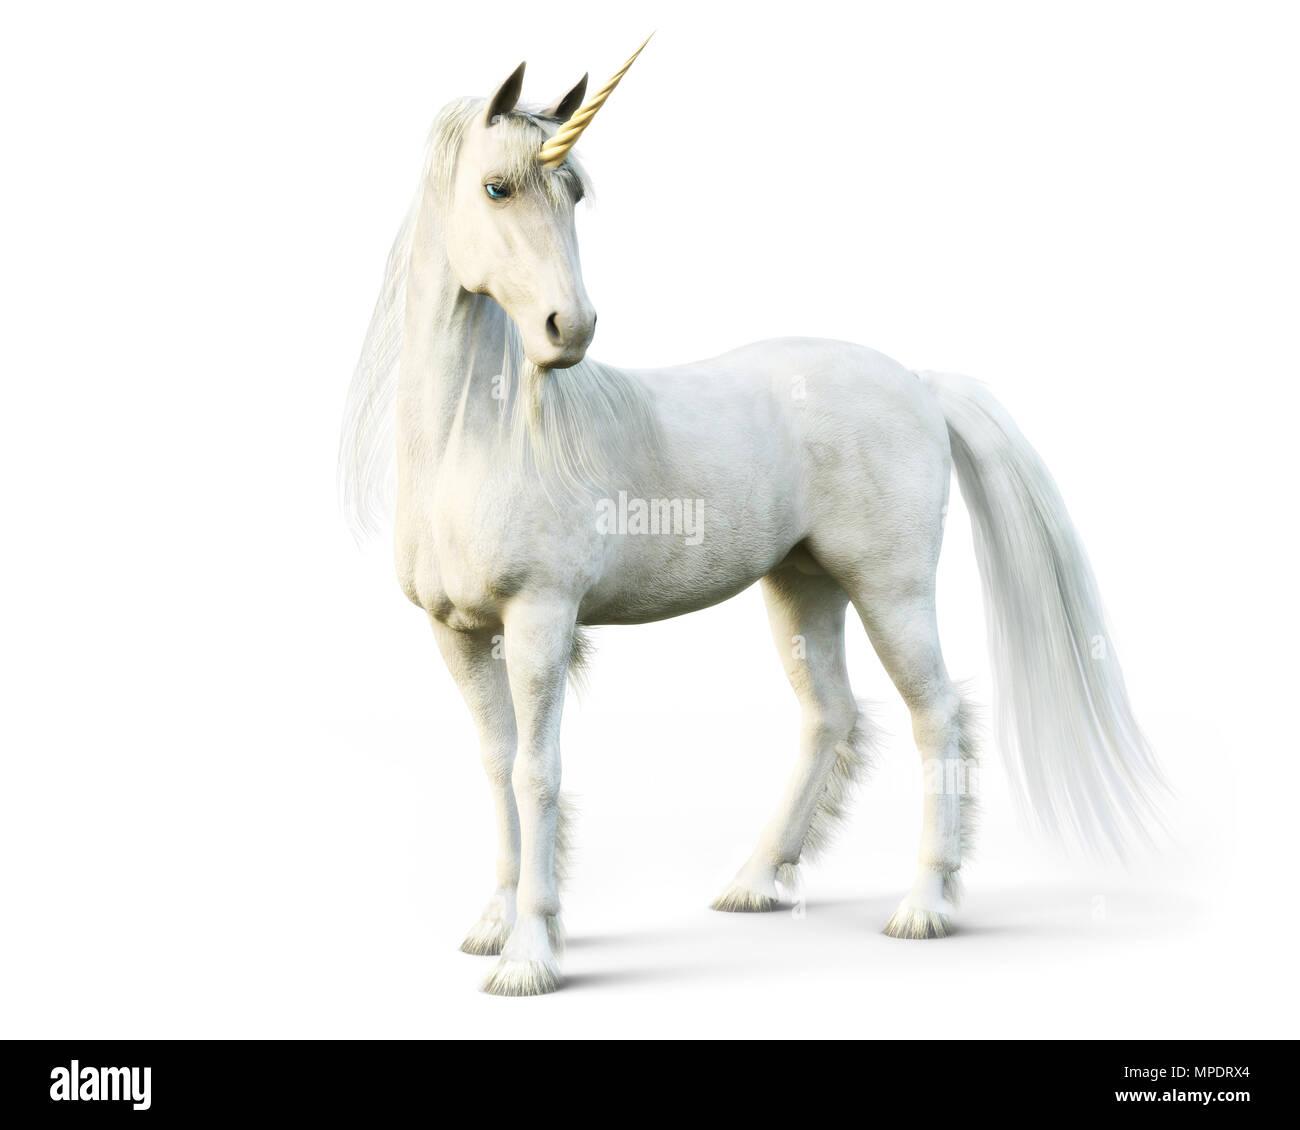 Mythical white Unicorn posing on a white isolated background. 3d rendering - Stock Image